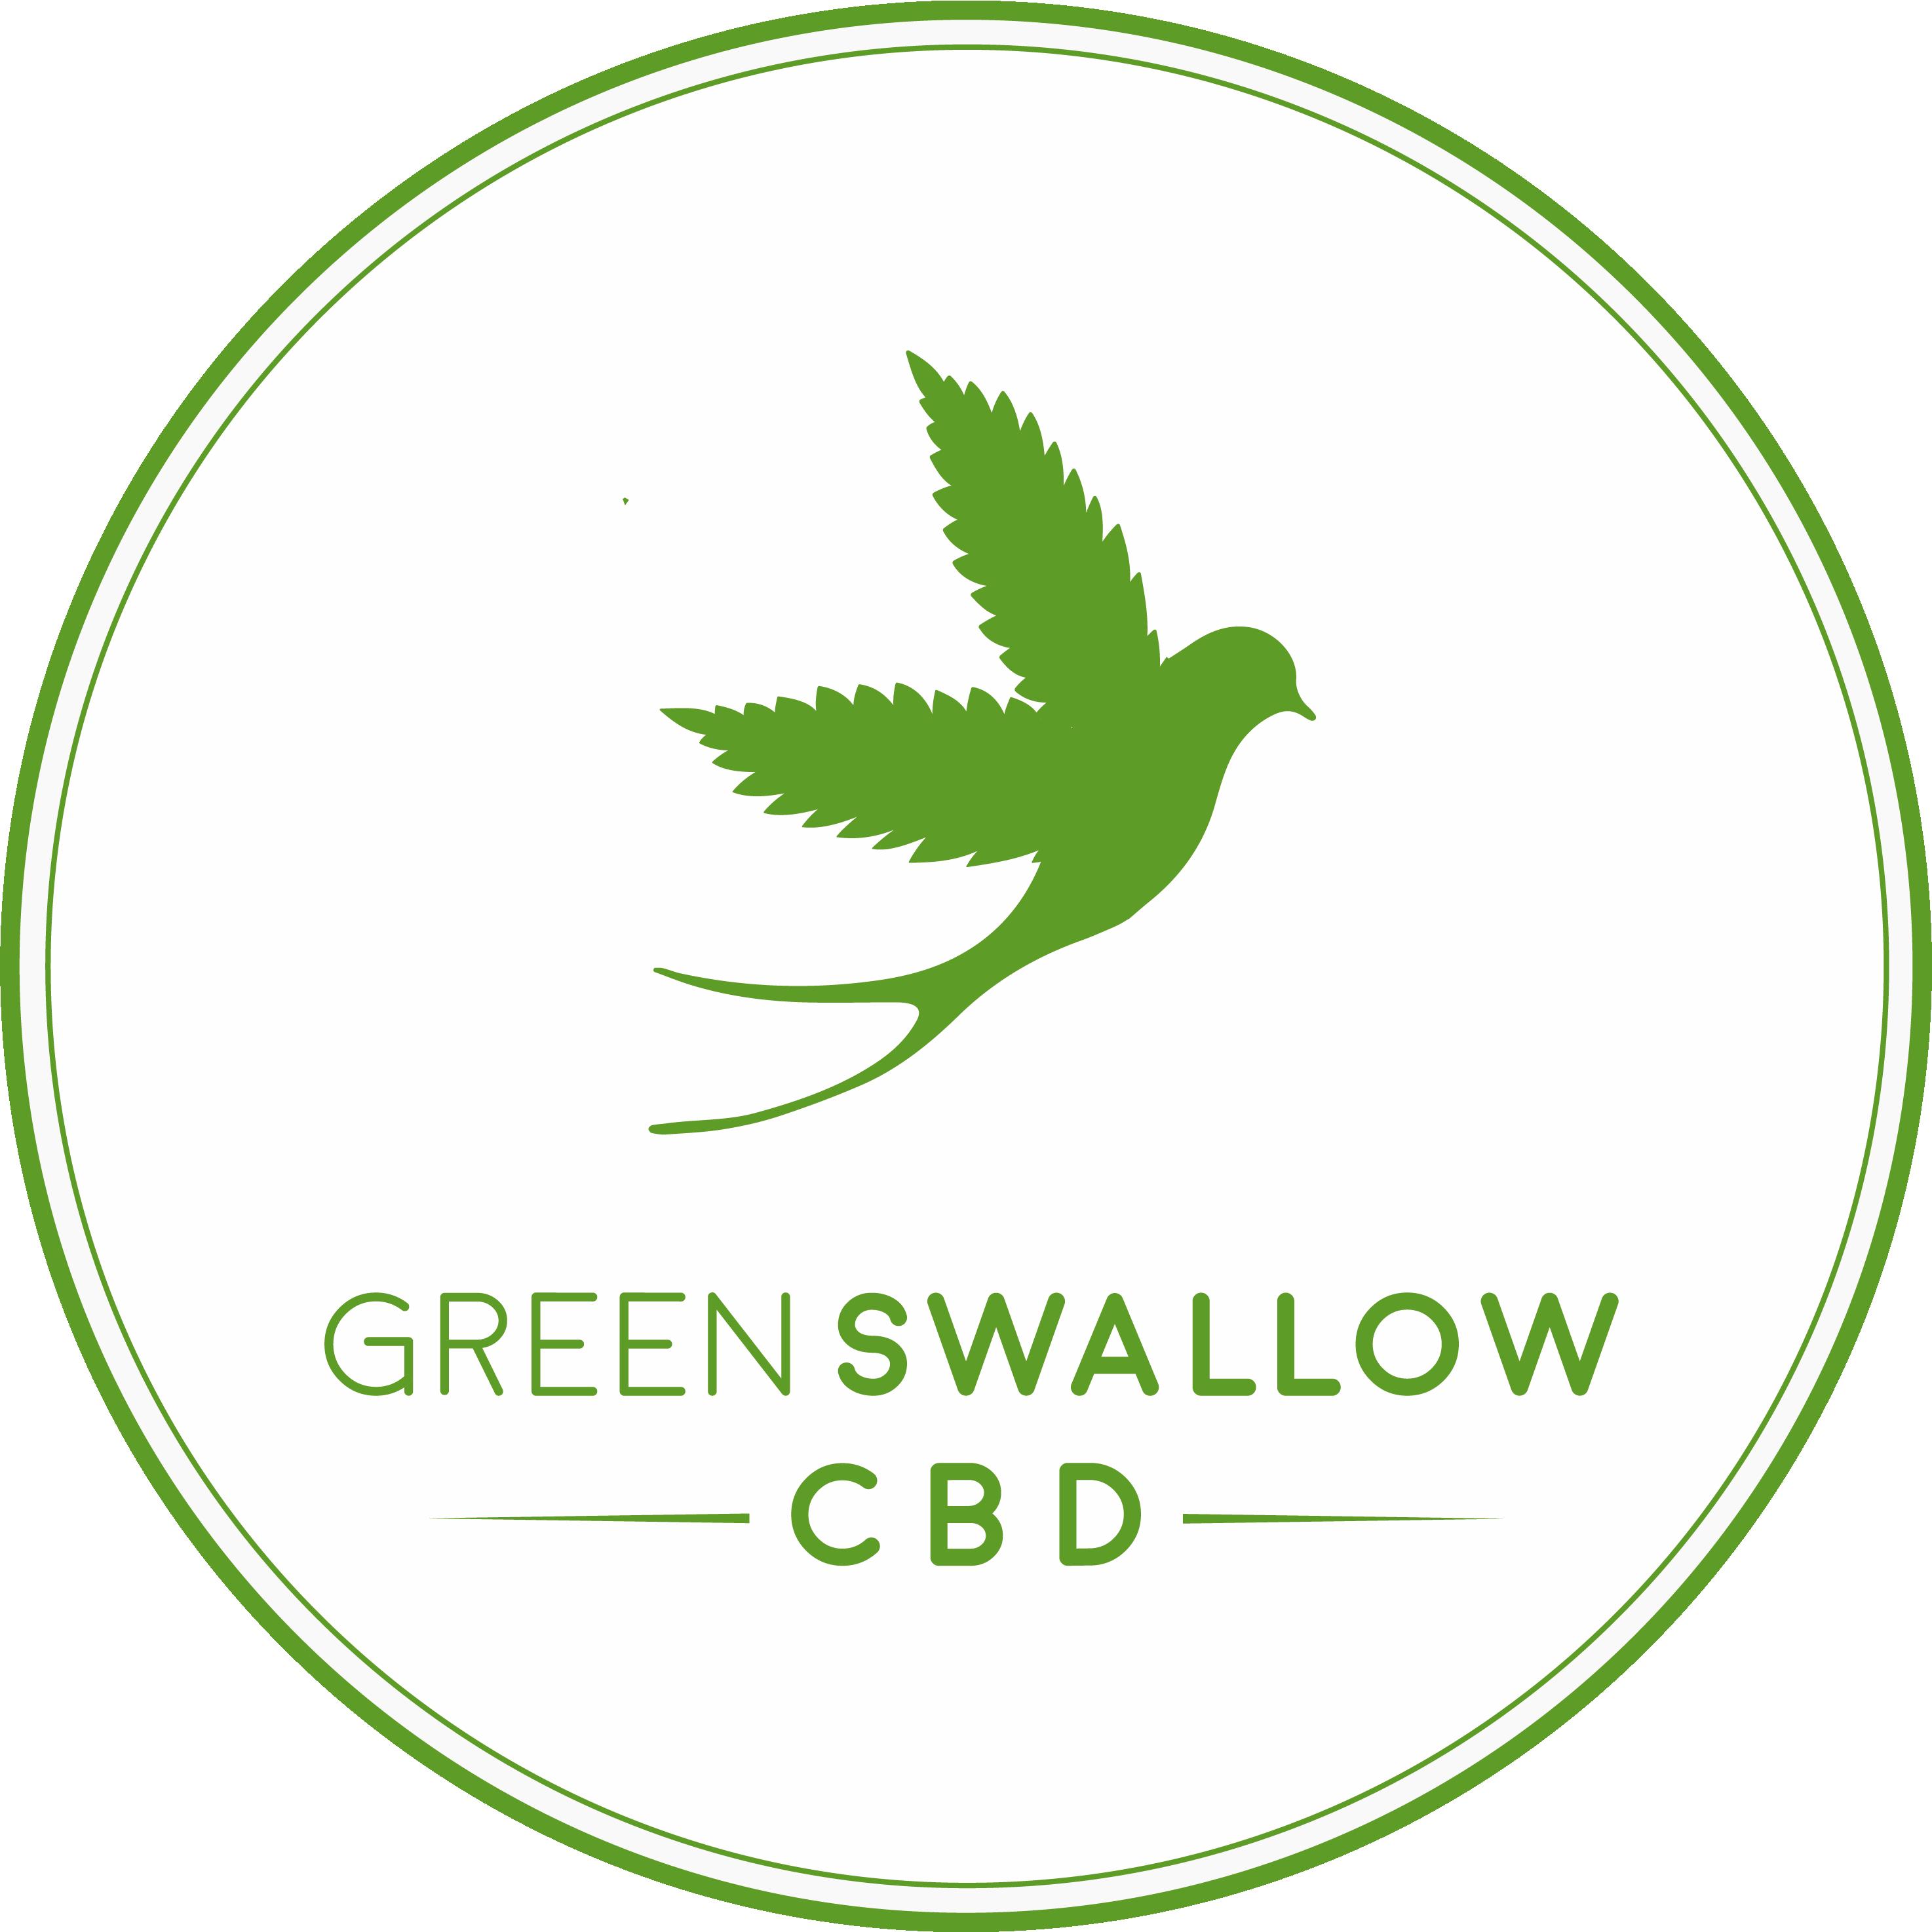 Green Swallow CBD